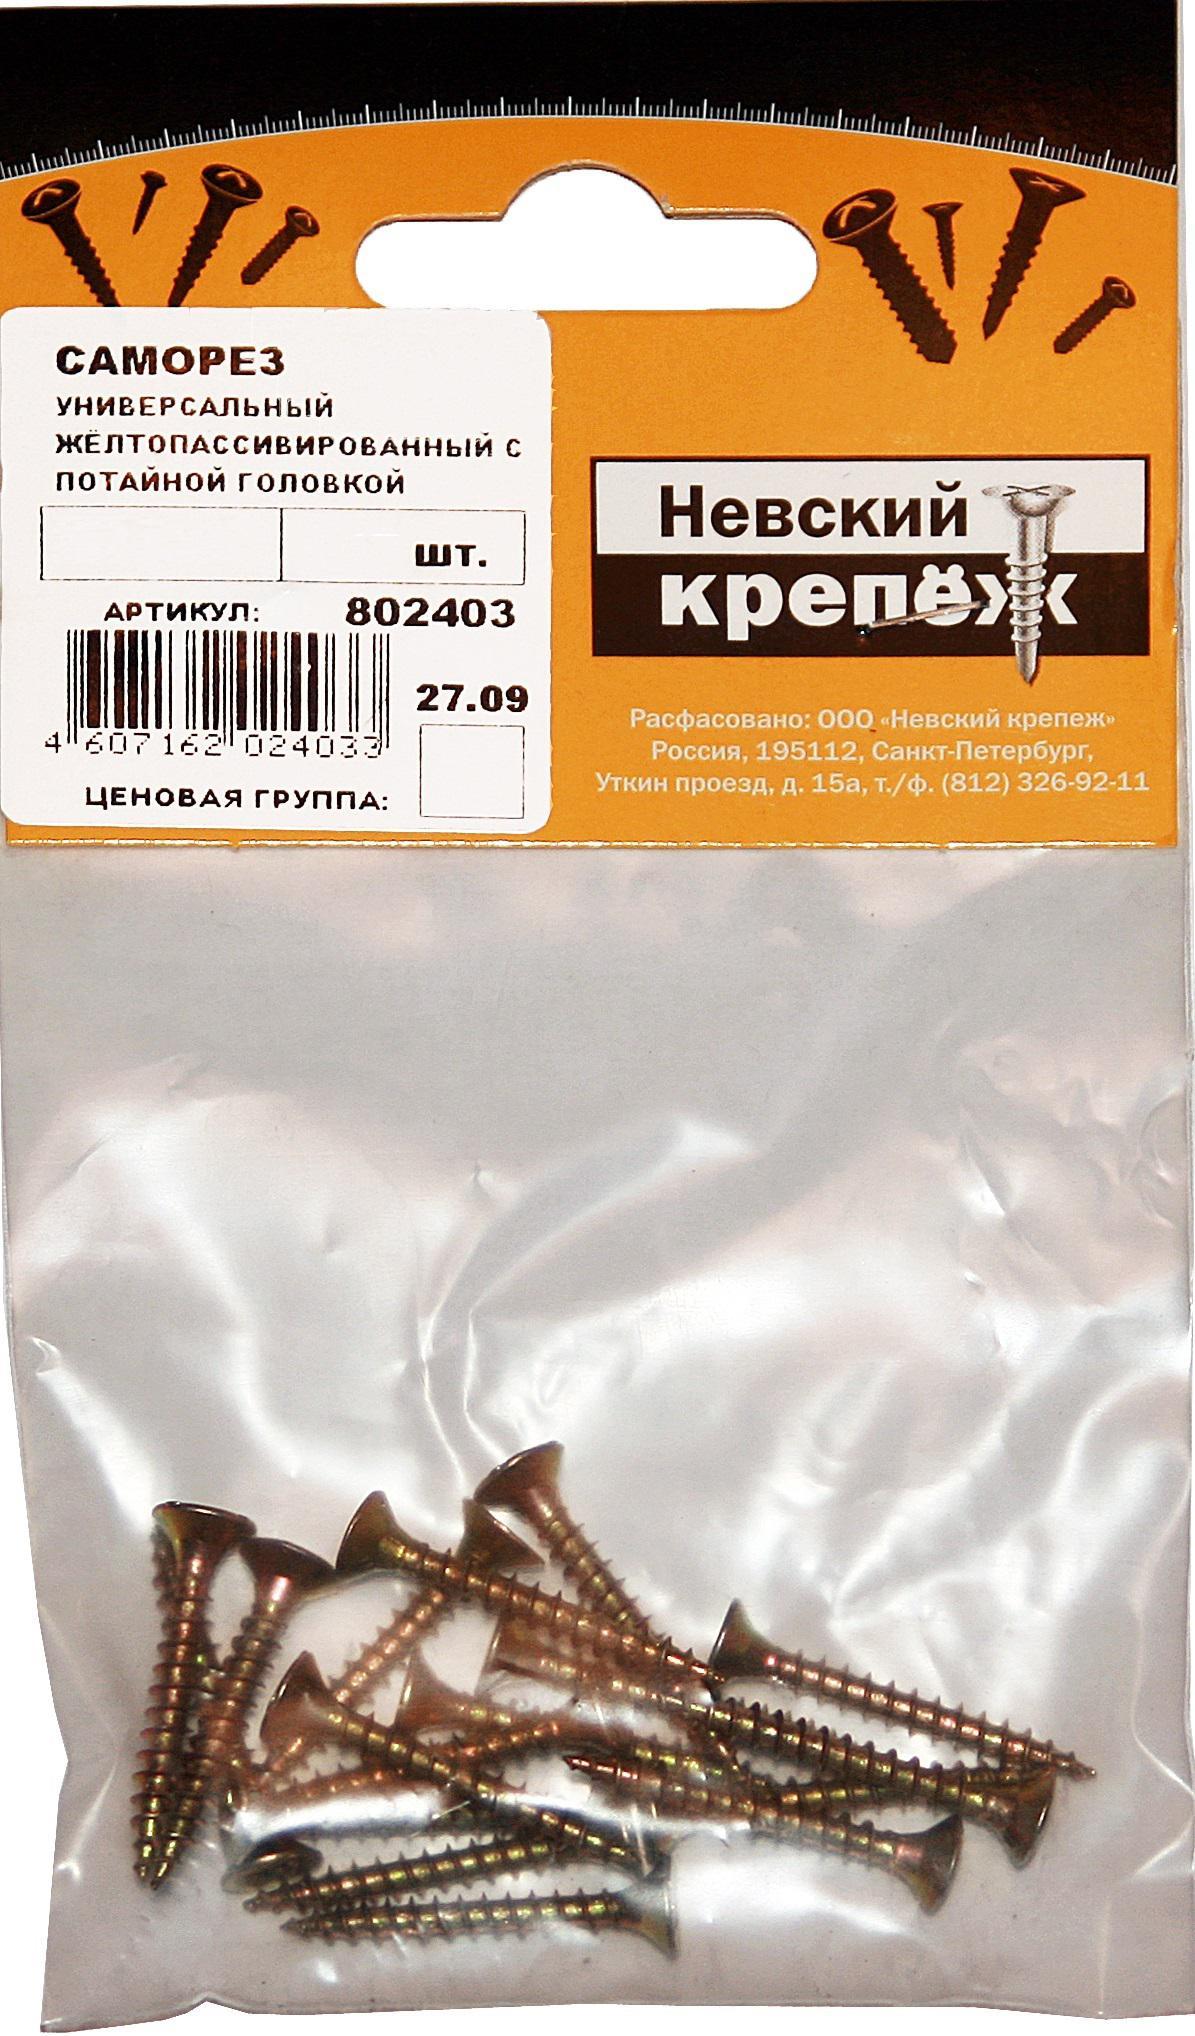 Саморез НЕВСКИЙ КРЕПЕЖ 802383